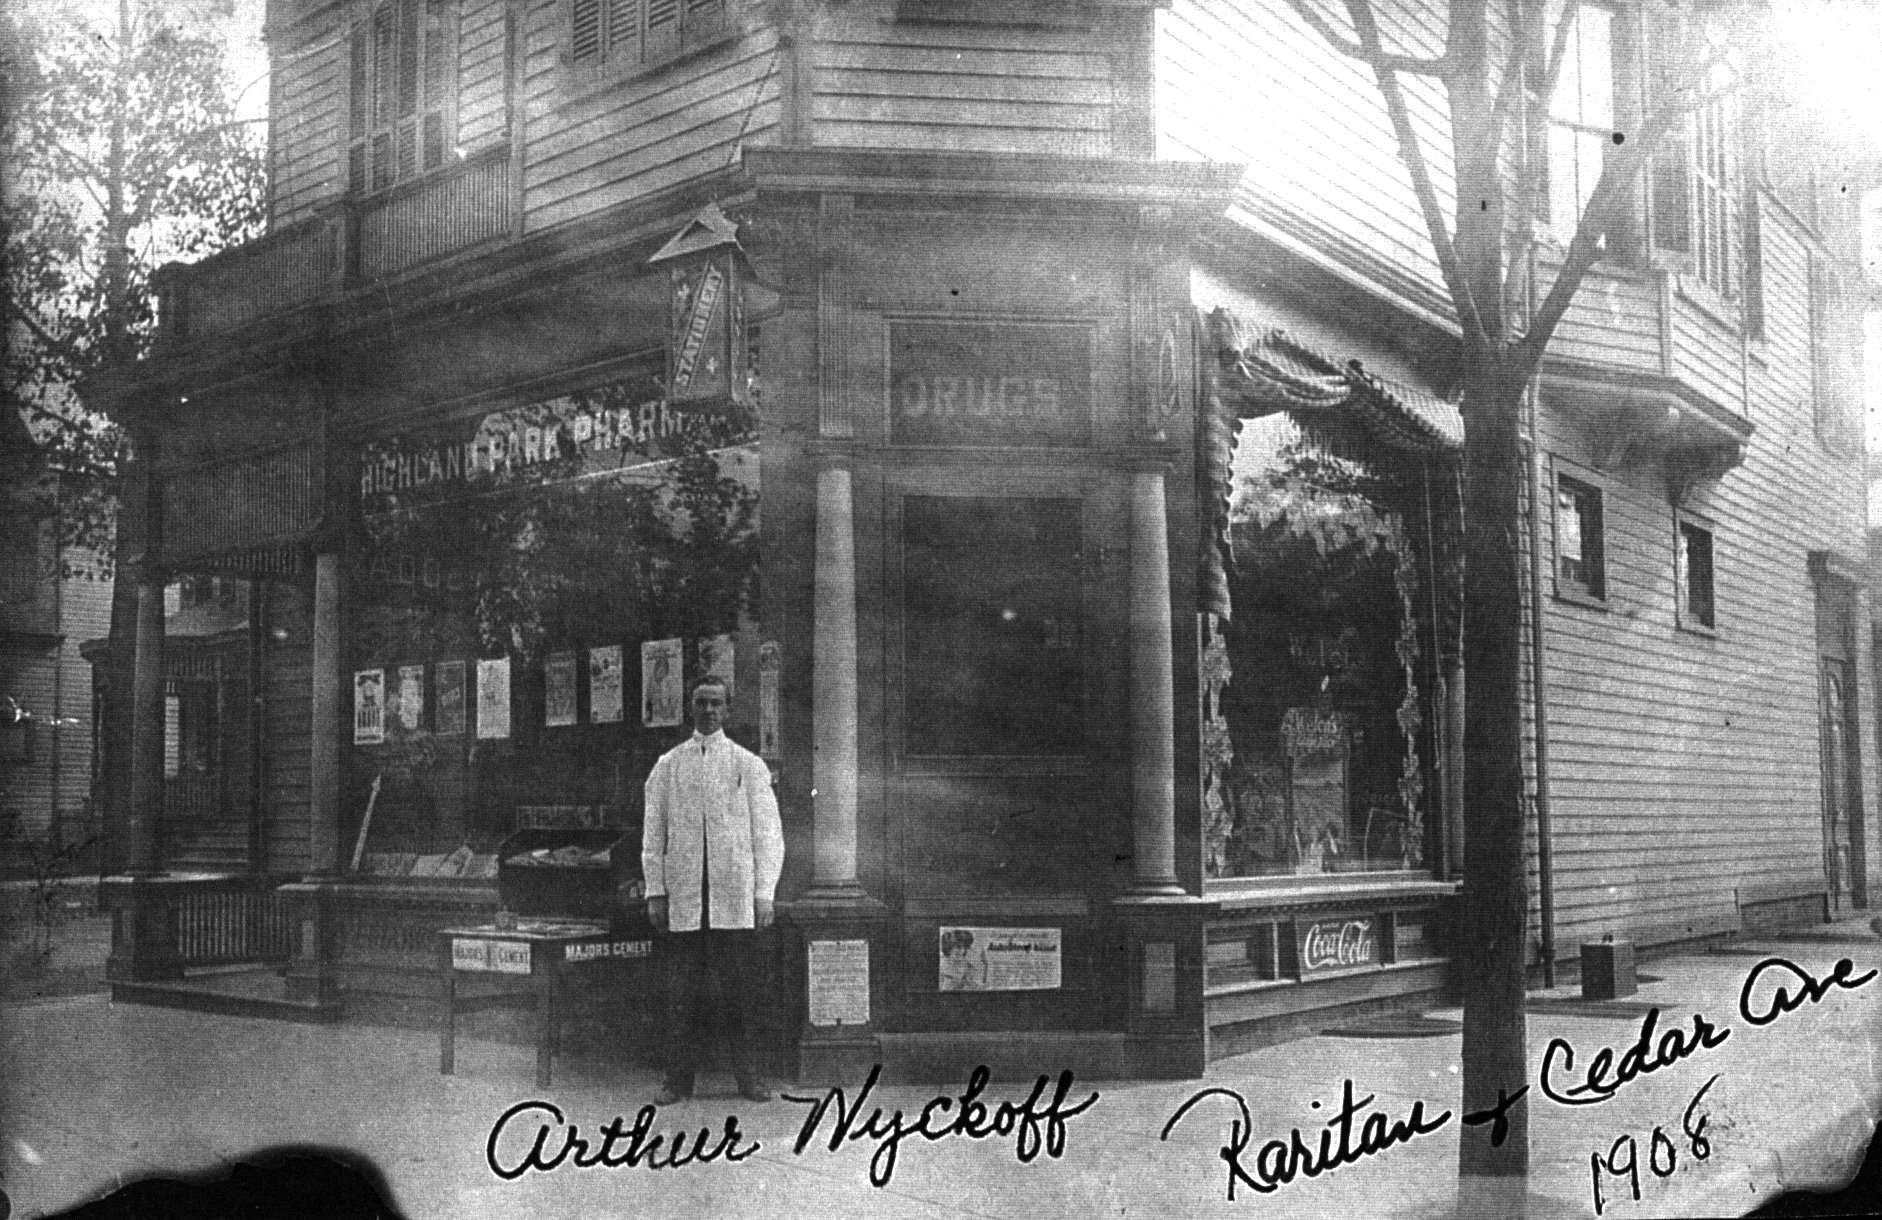 Hoagland's Highland Park Pharmacy in 1908